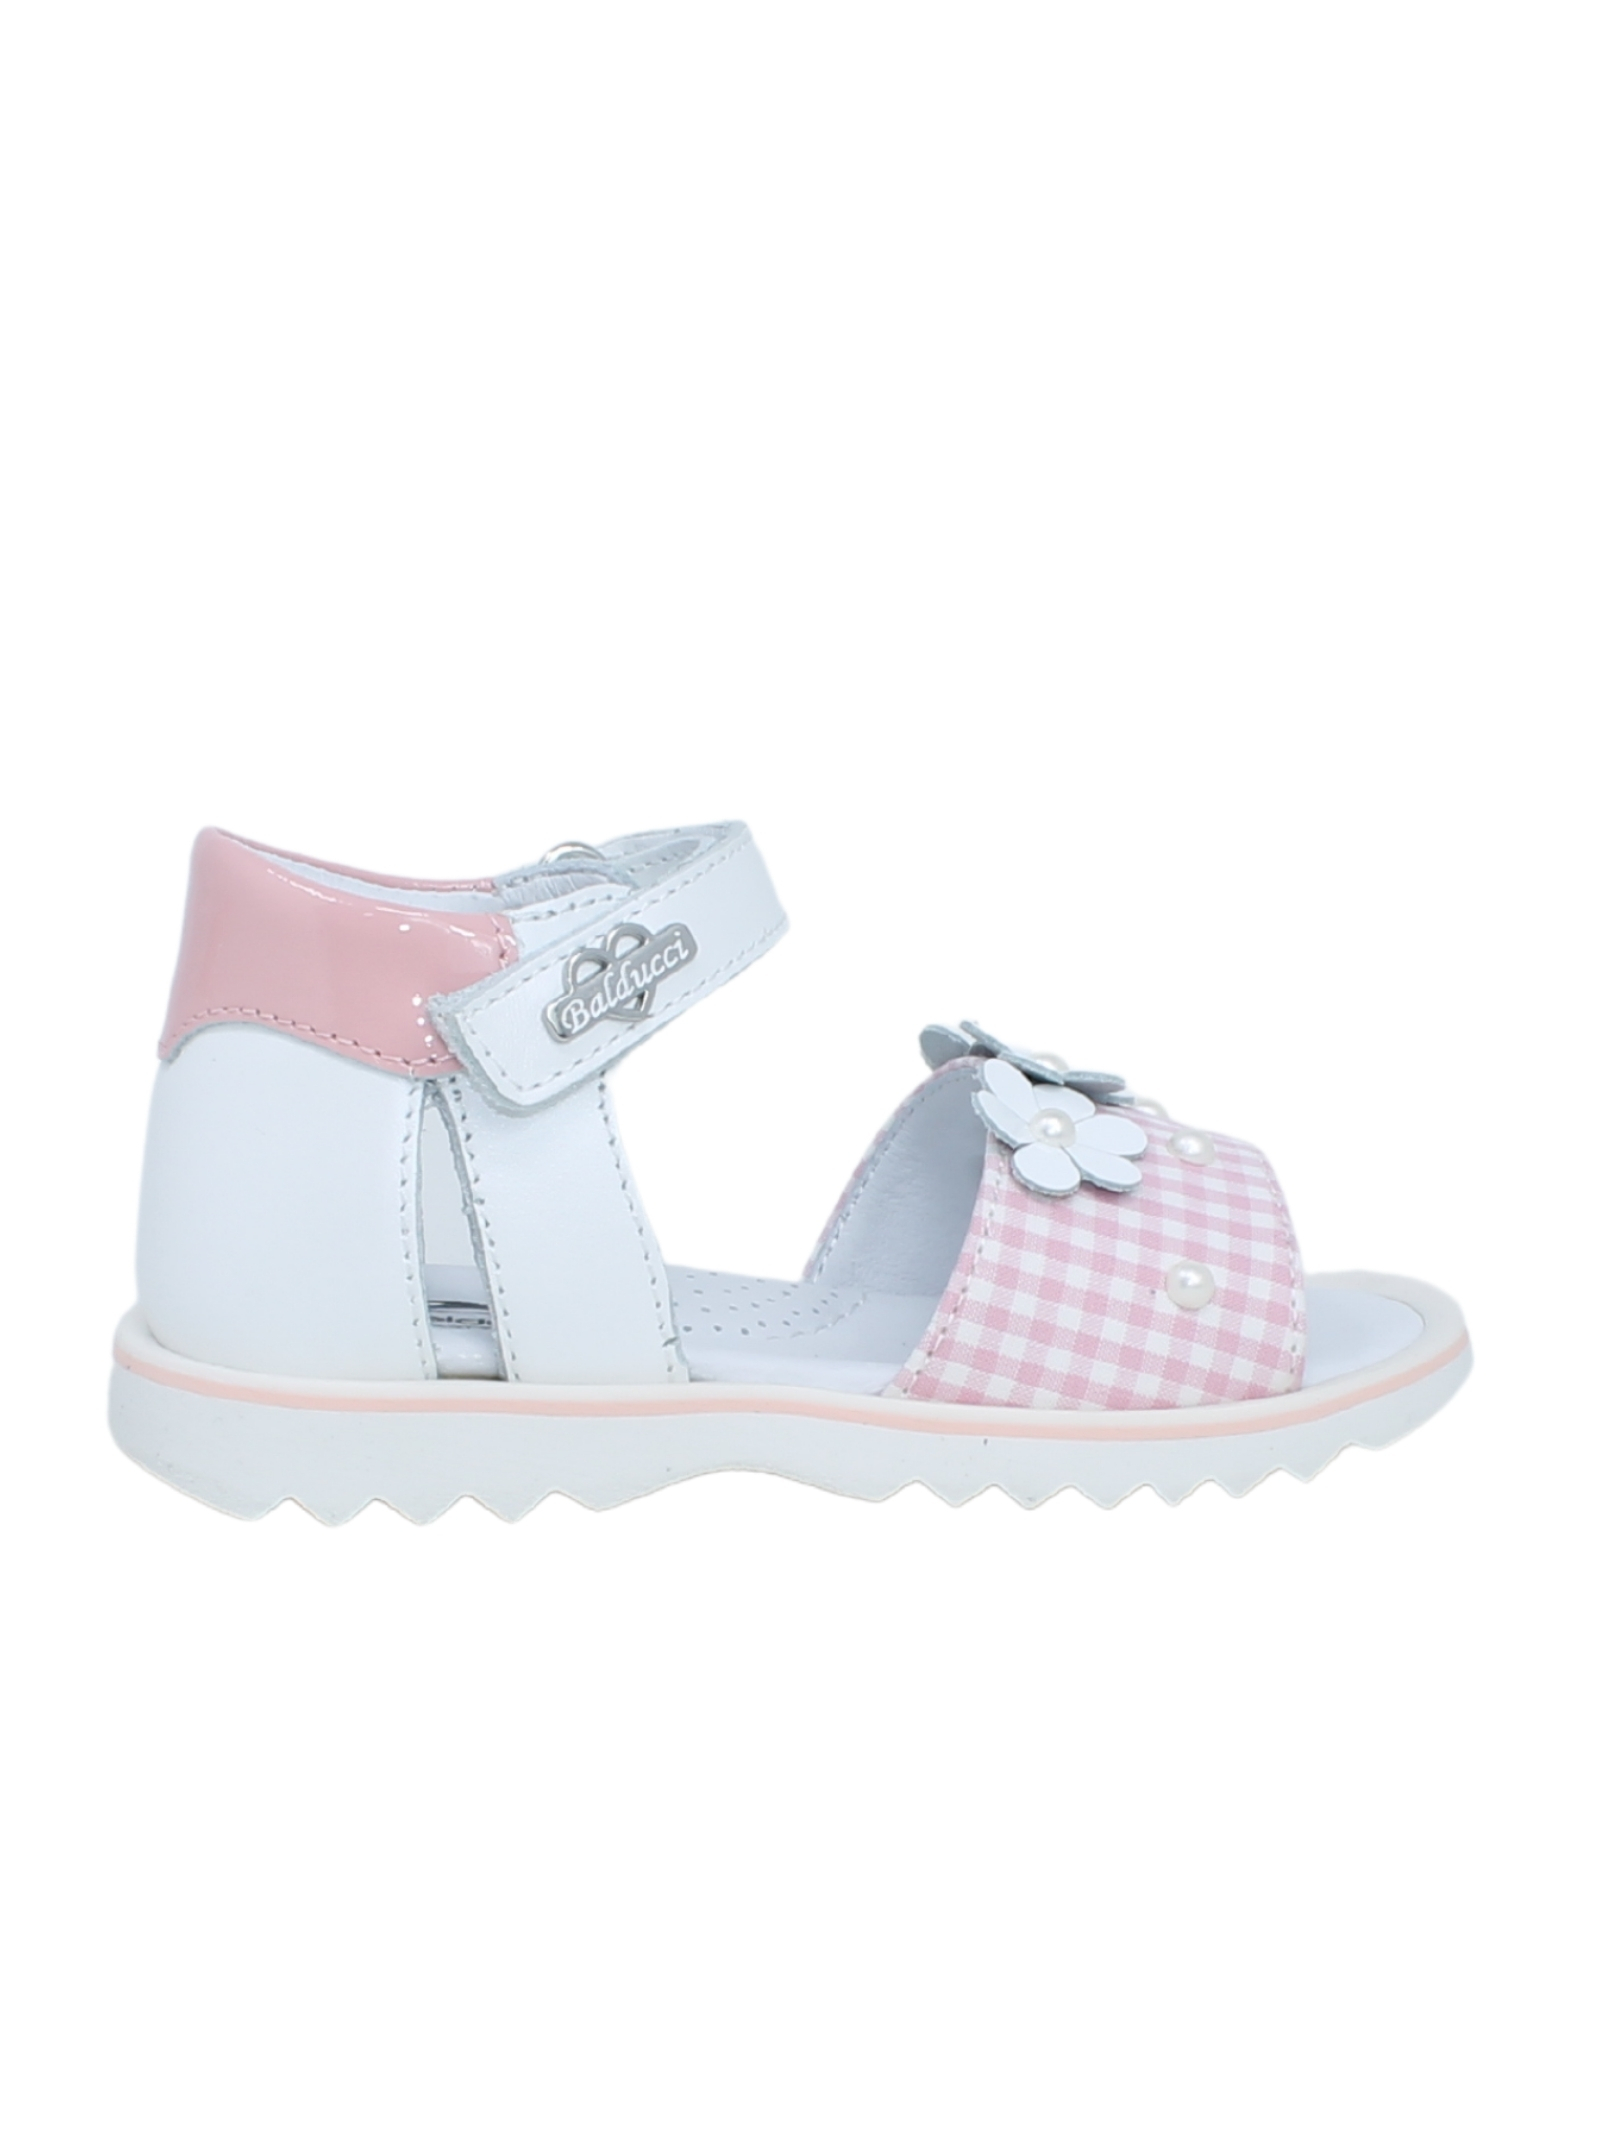 BALDUCCI | Sandals | CSPO4454B13010